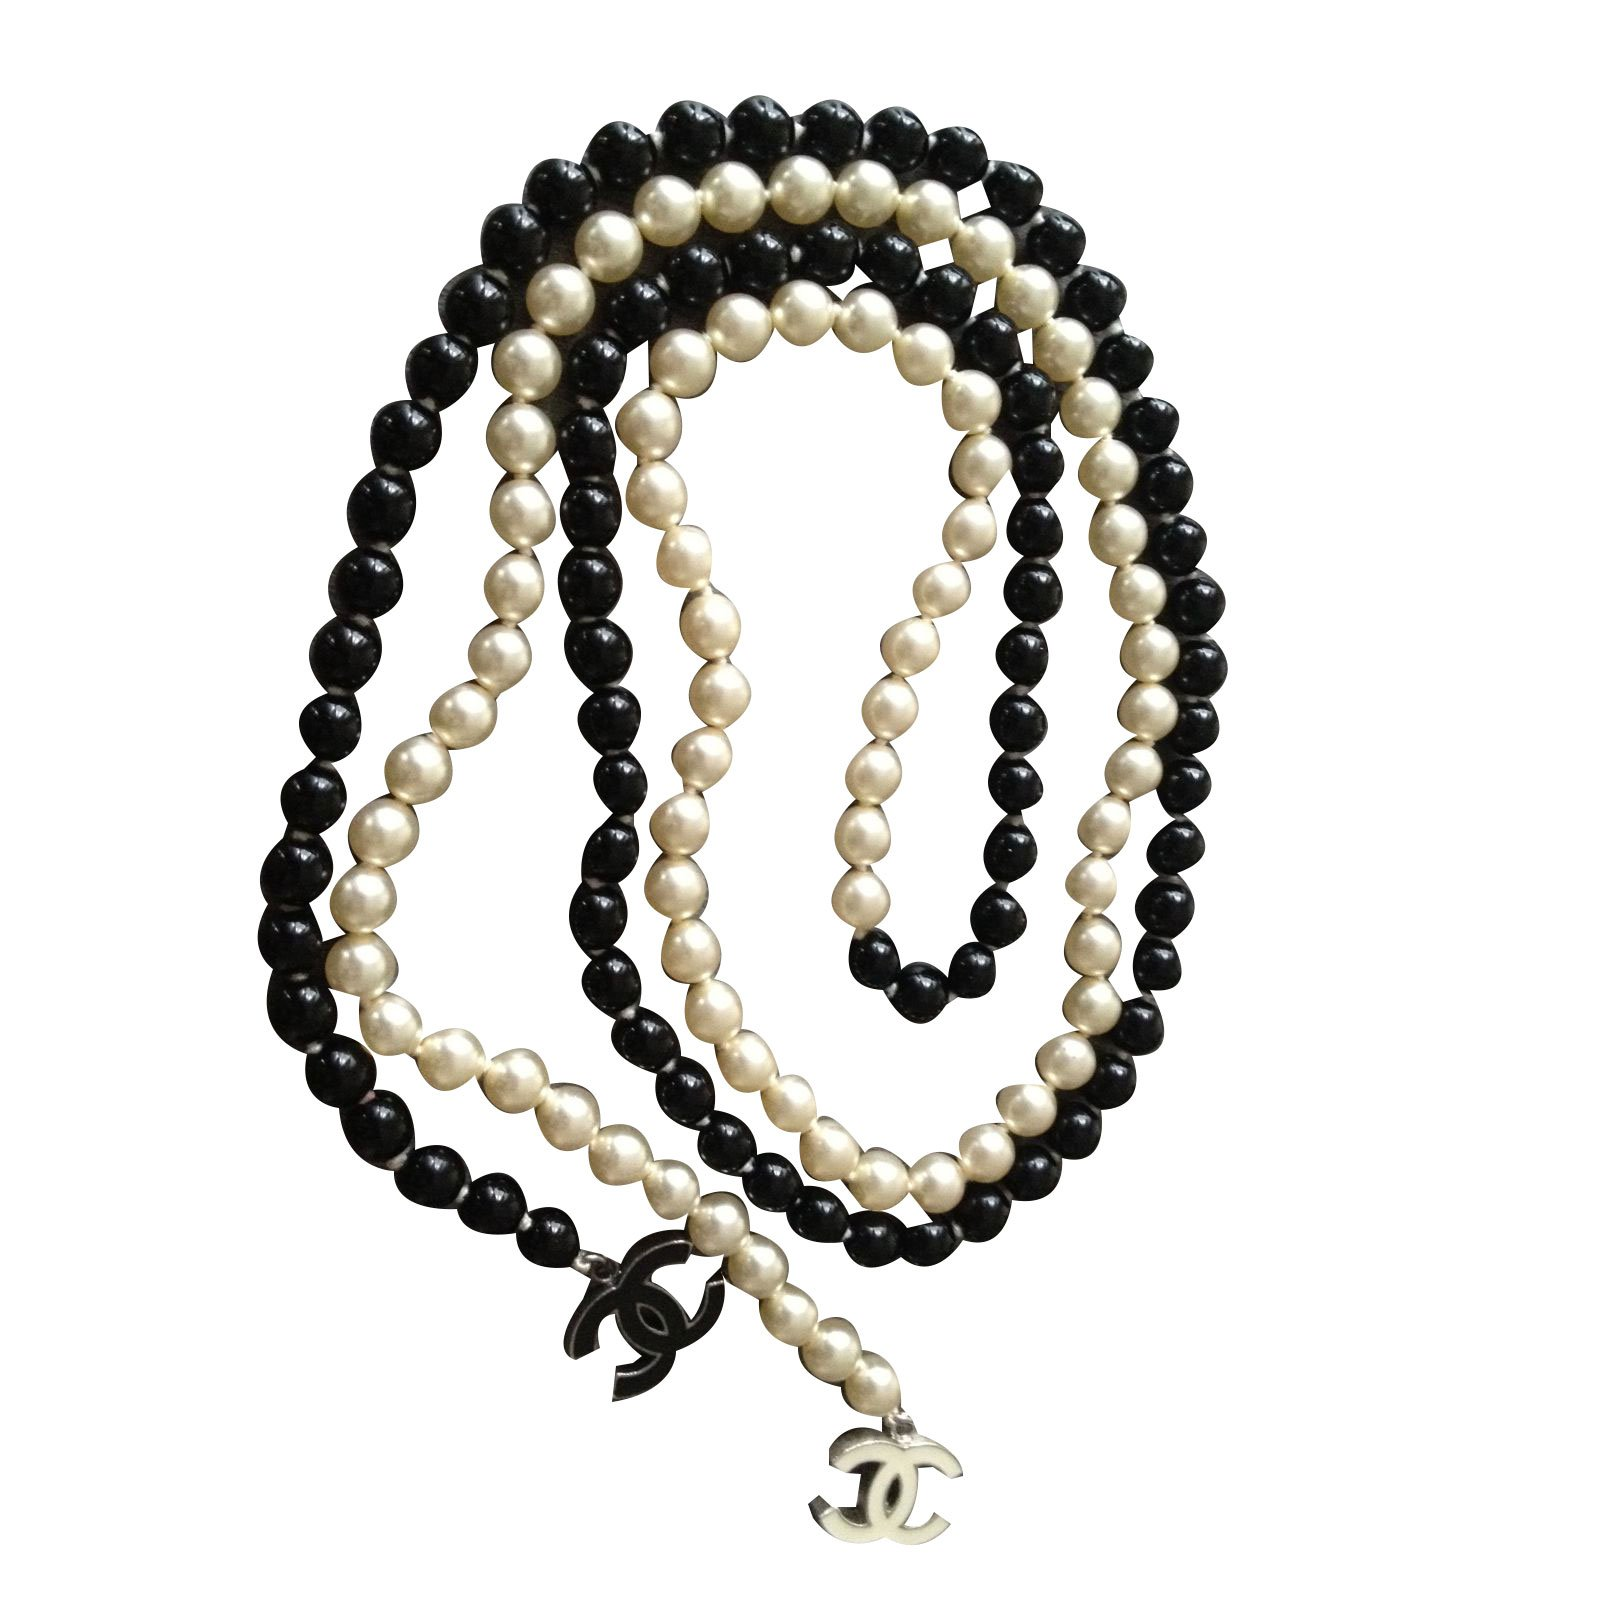 Sautoirs Chanel Collier Perle Noir,Blanc ref.44737